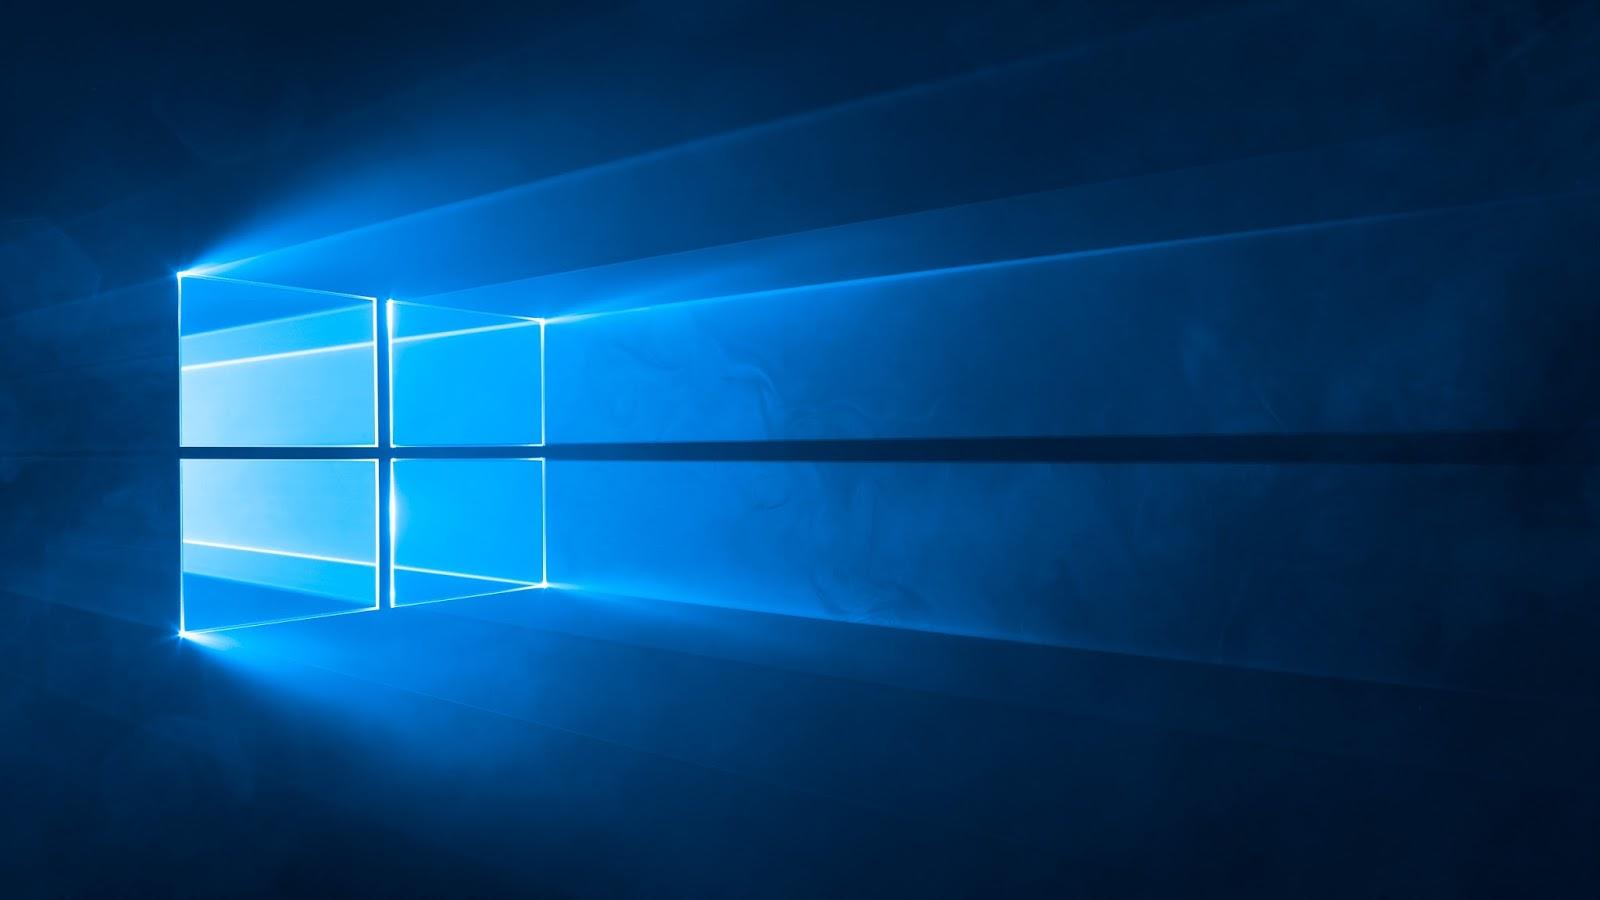 42 Download Wallpaper For Windows 10 On Wallpapersafari